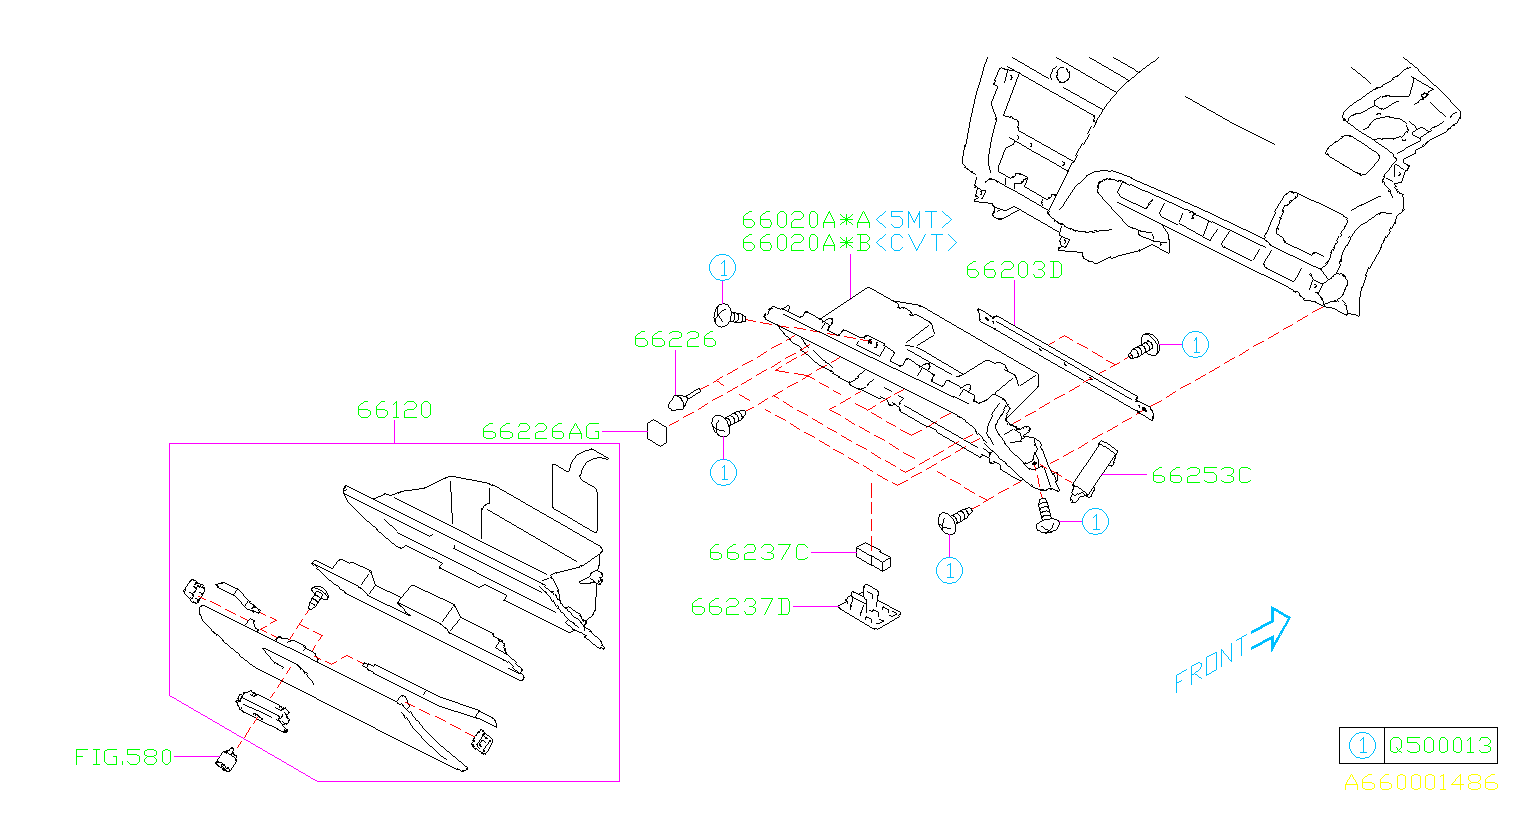 66237sa010 - Glove Box Light  Umber   Panel  Instrument  Bulb